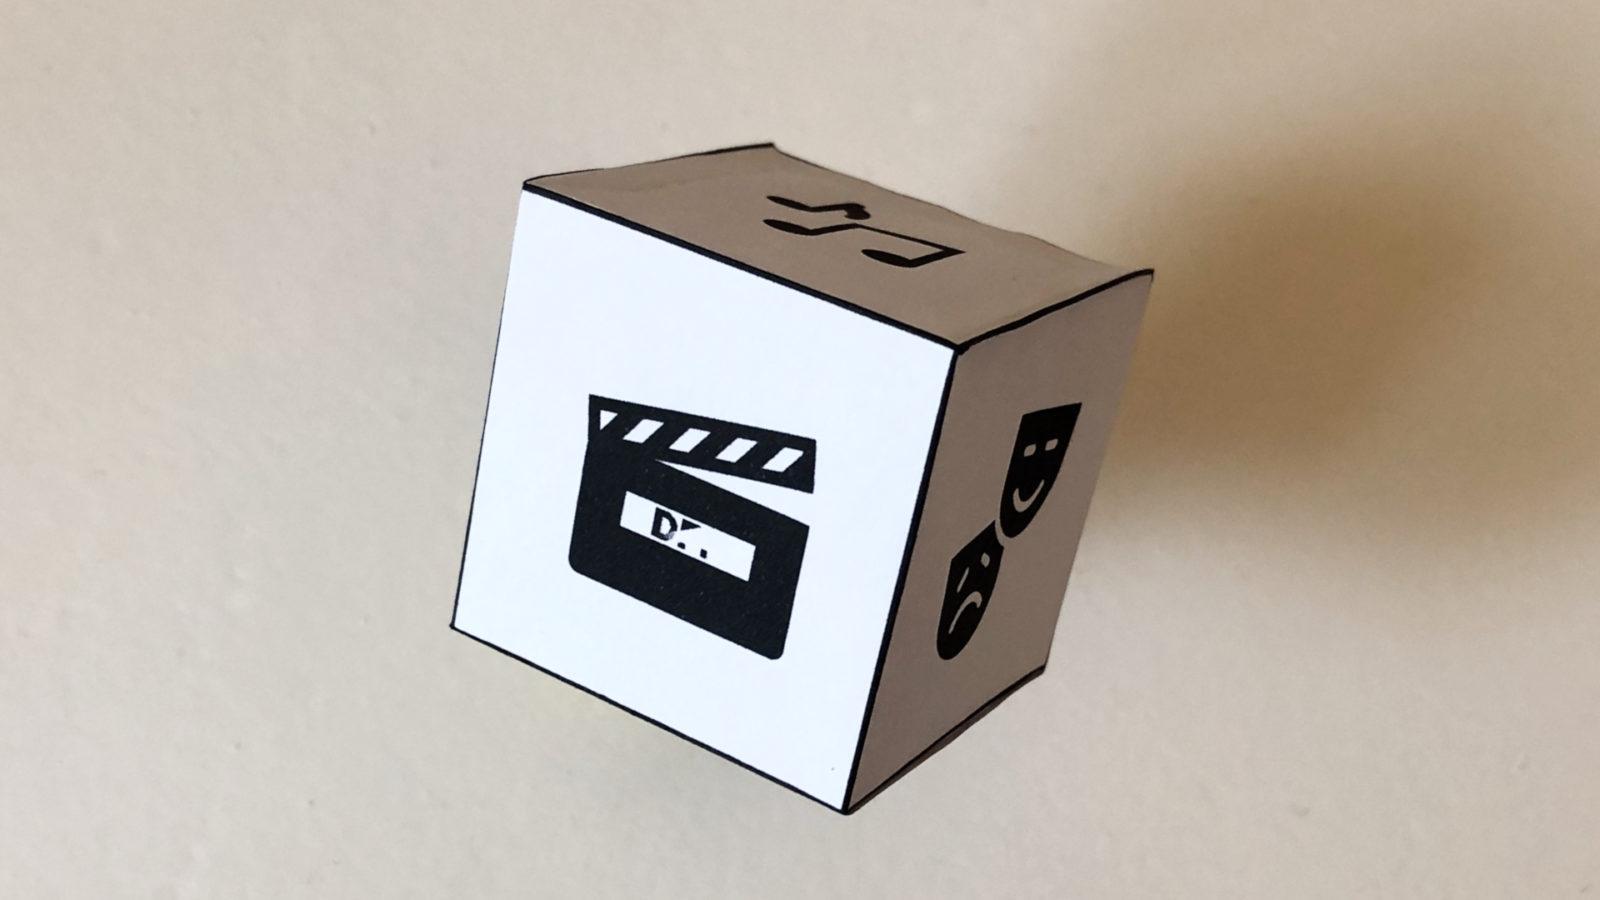 Filmwuerfel (1)_1920x1080